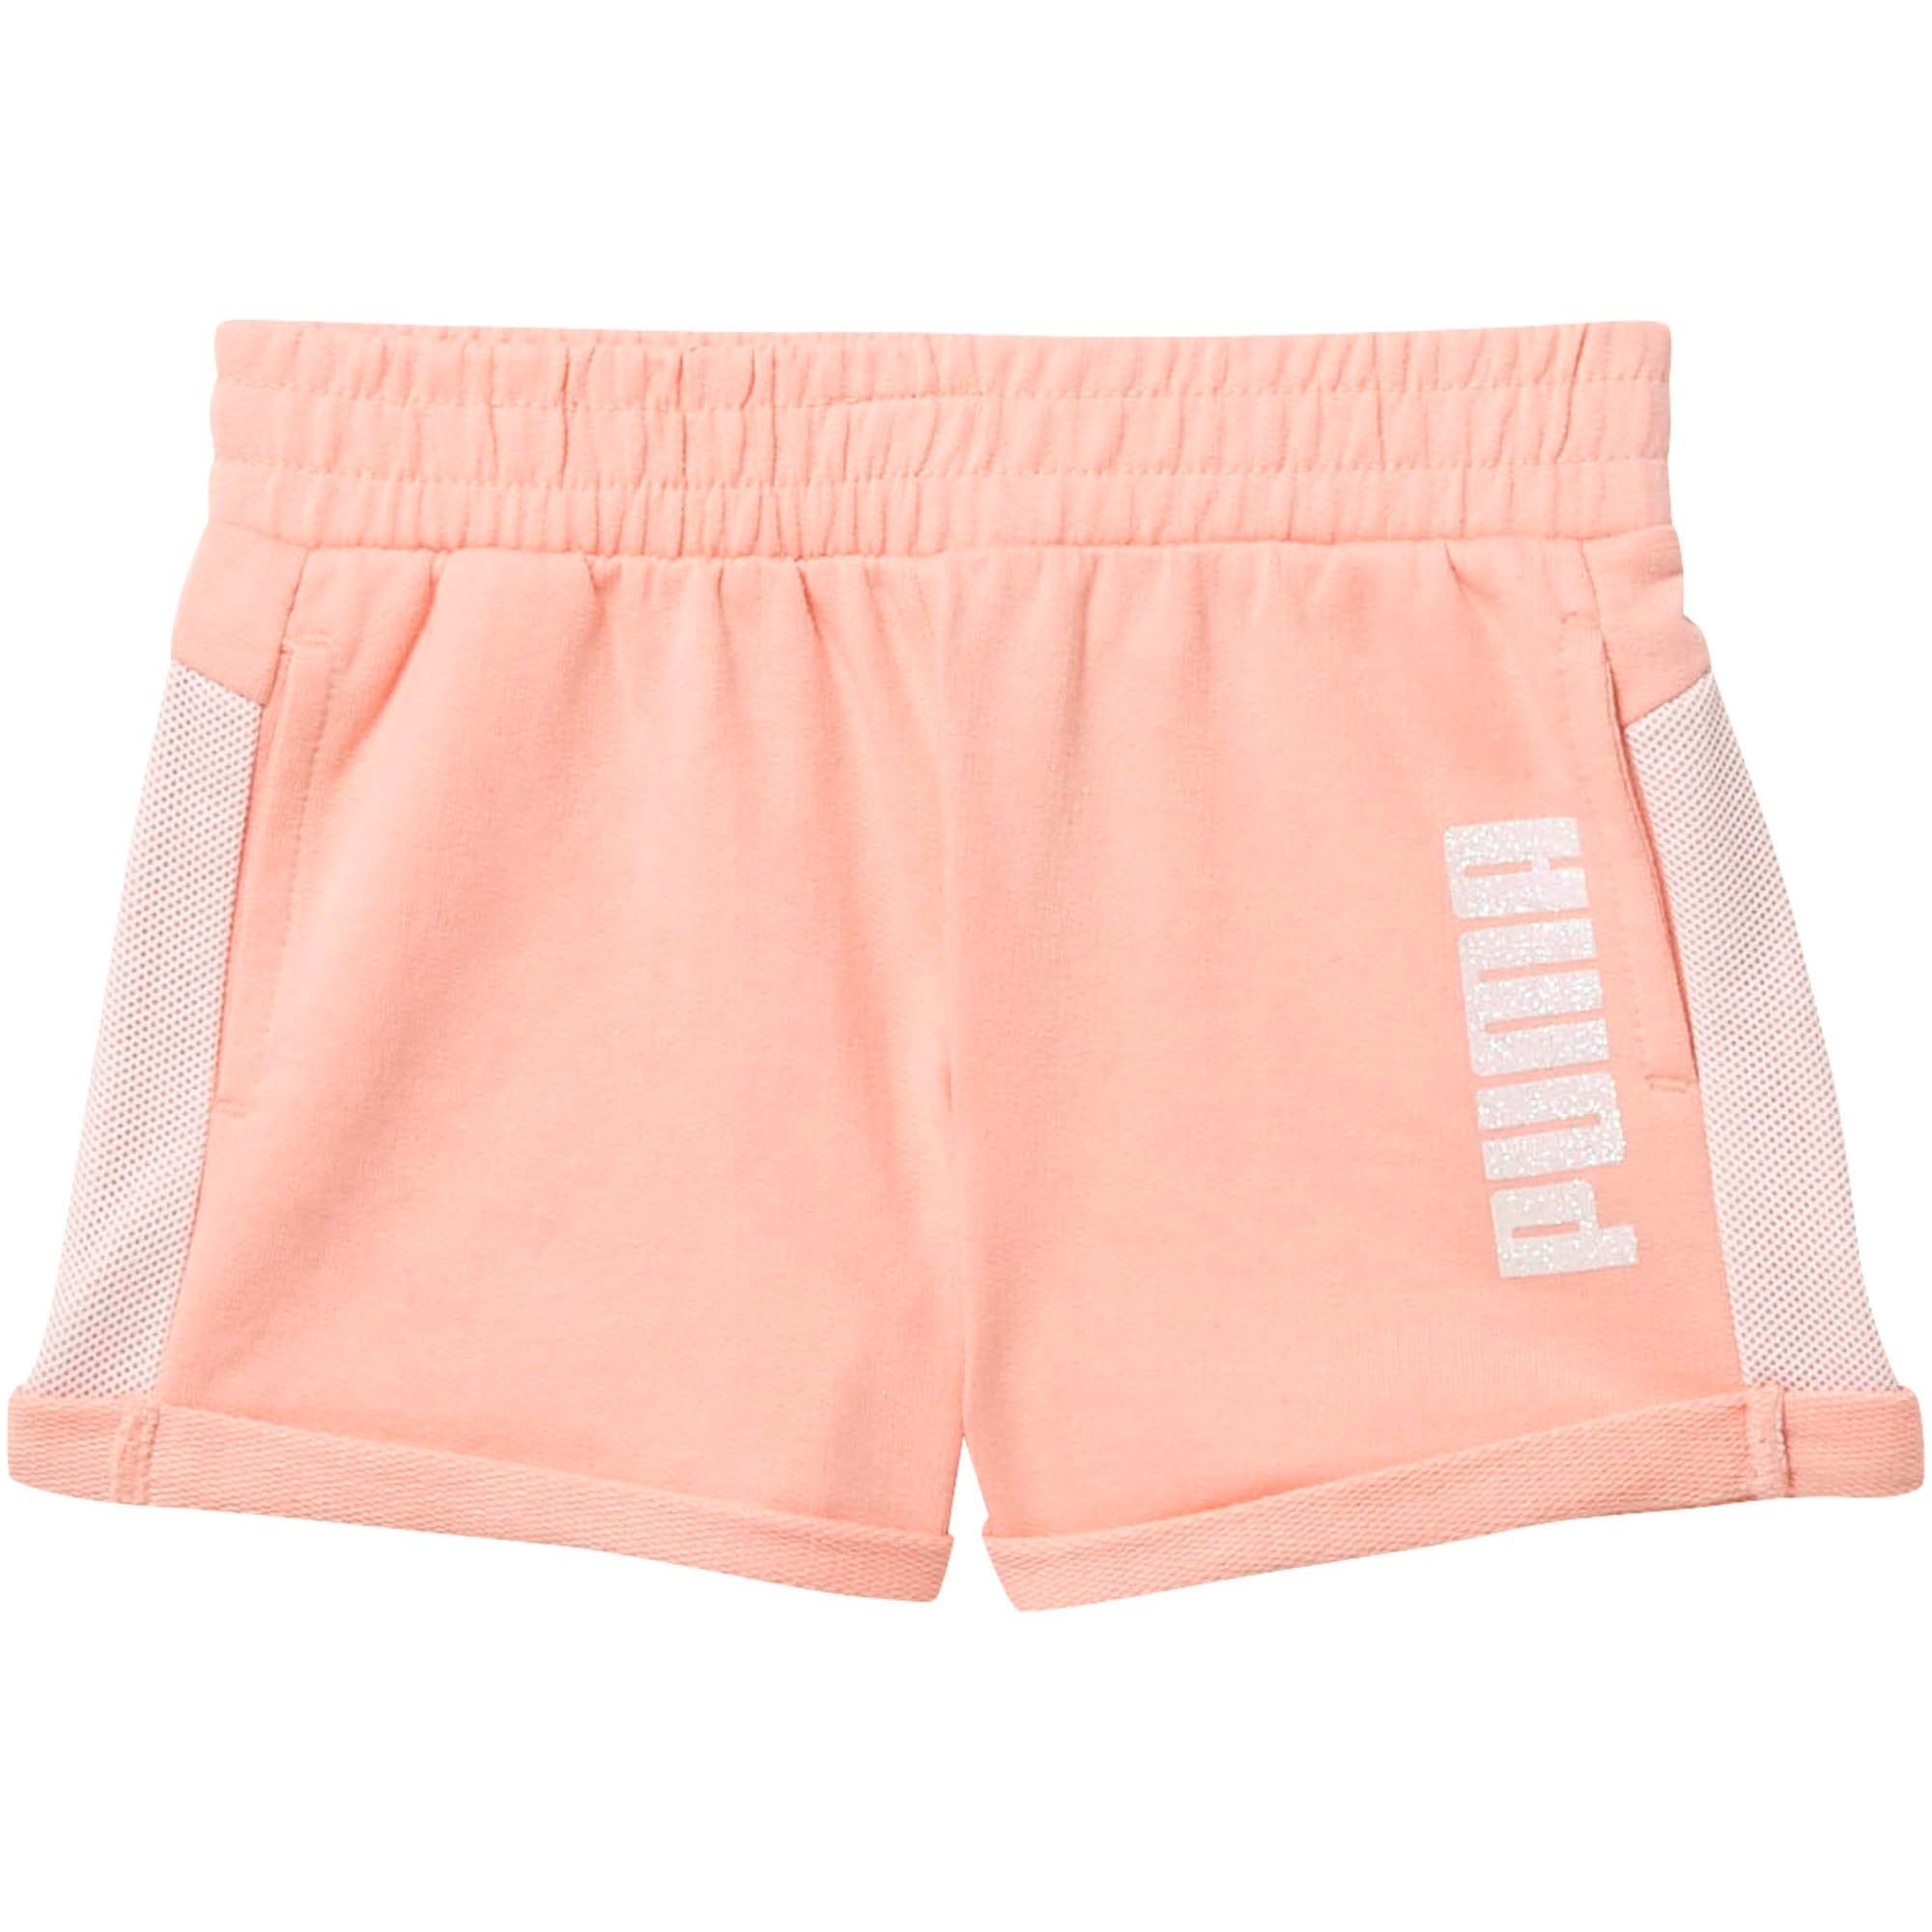 Thumbnail 1 of Mesh Fashion Toddler Shorts, PEACH BUD, medium